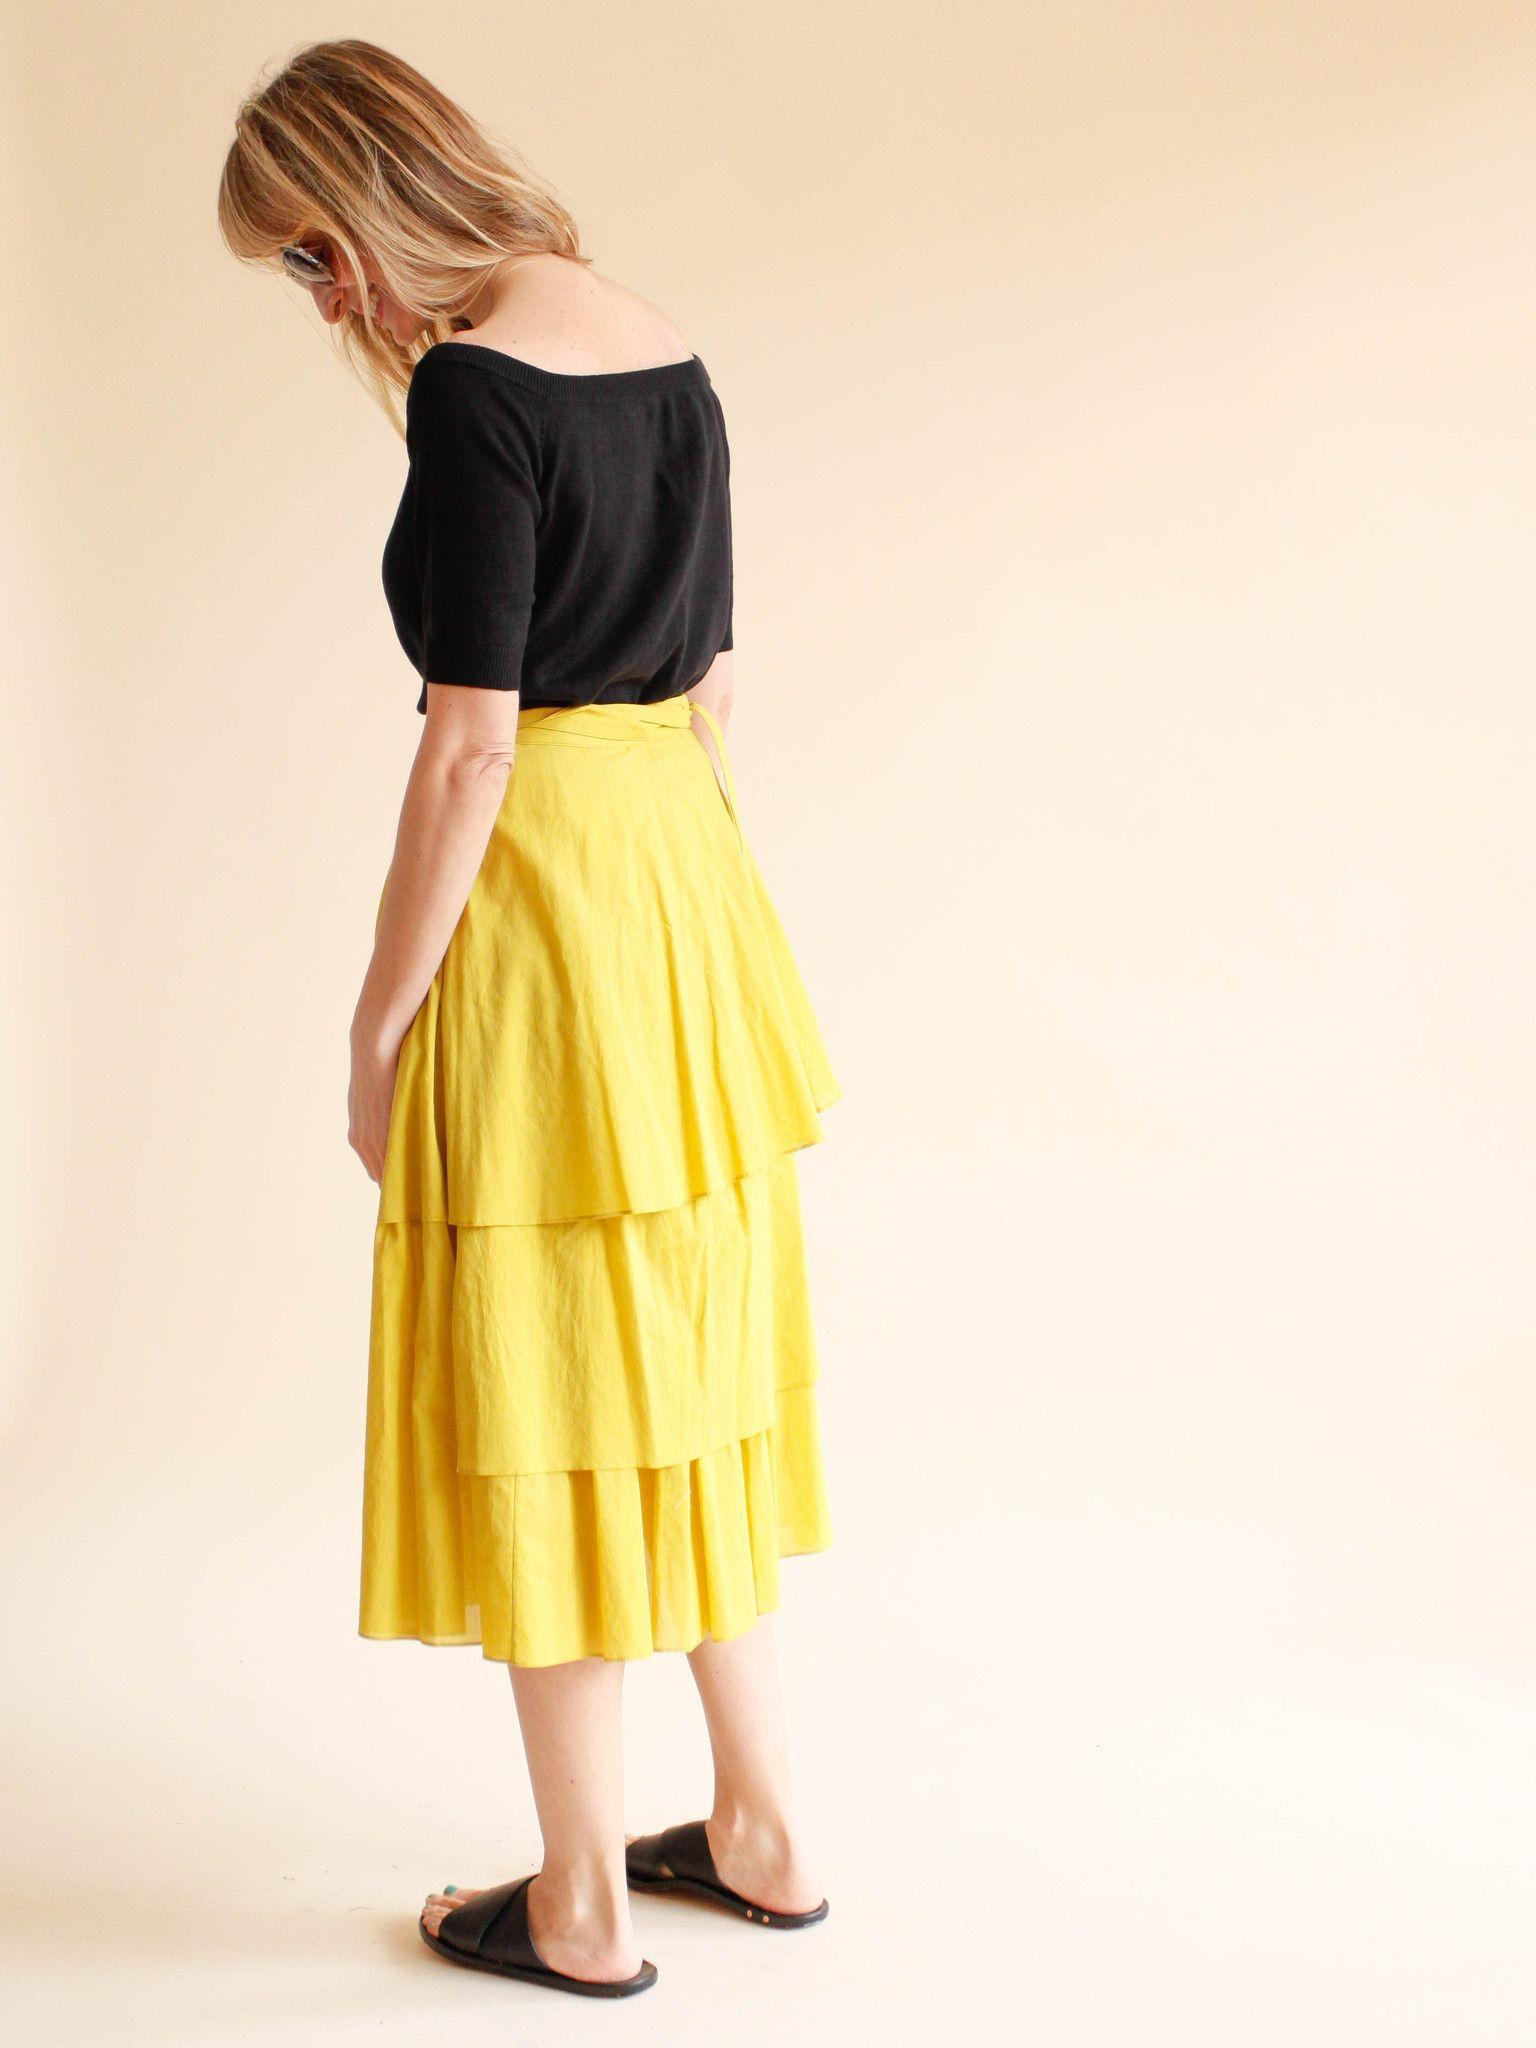 SVILU - Wrap Skirt - Organic Cotton Voile - Korma